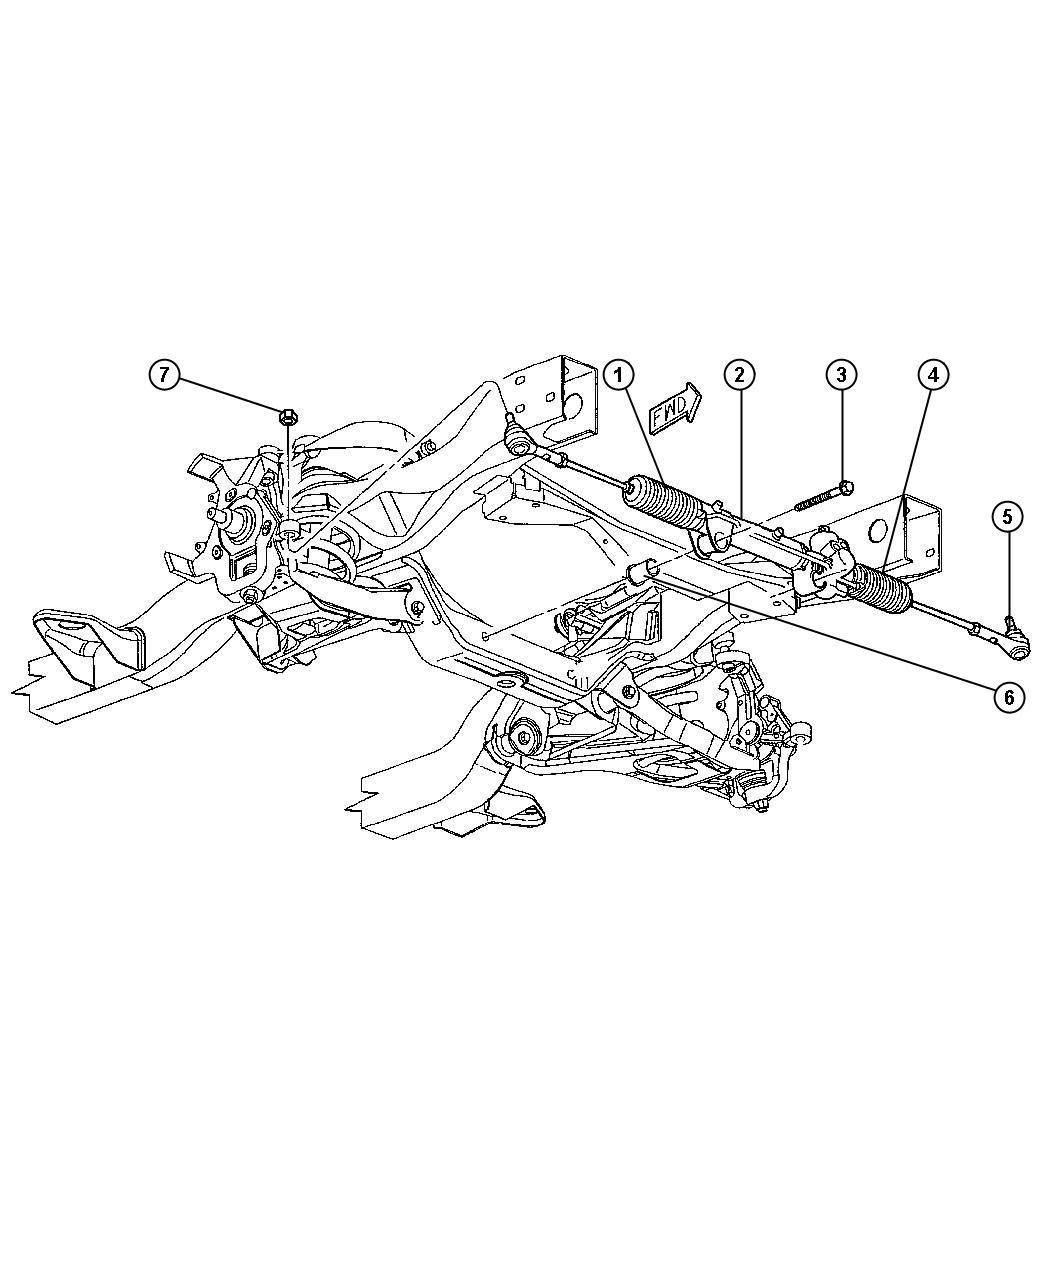 Search Results 2001 Dodge Durango Engine Diagram.html